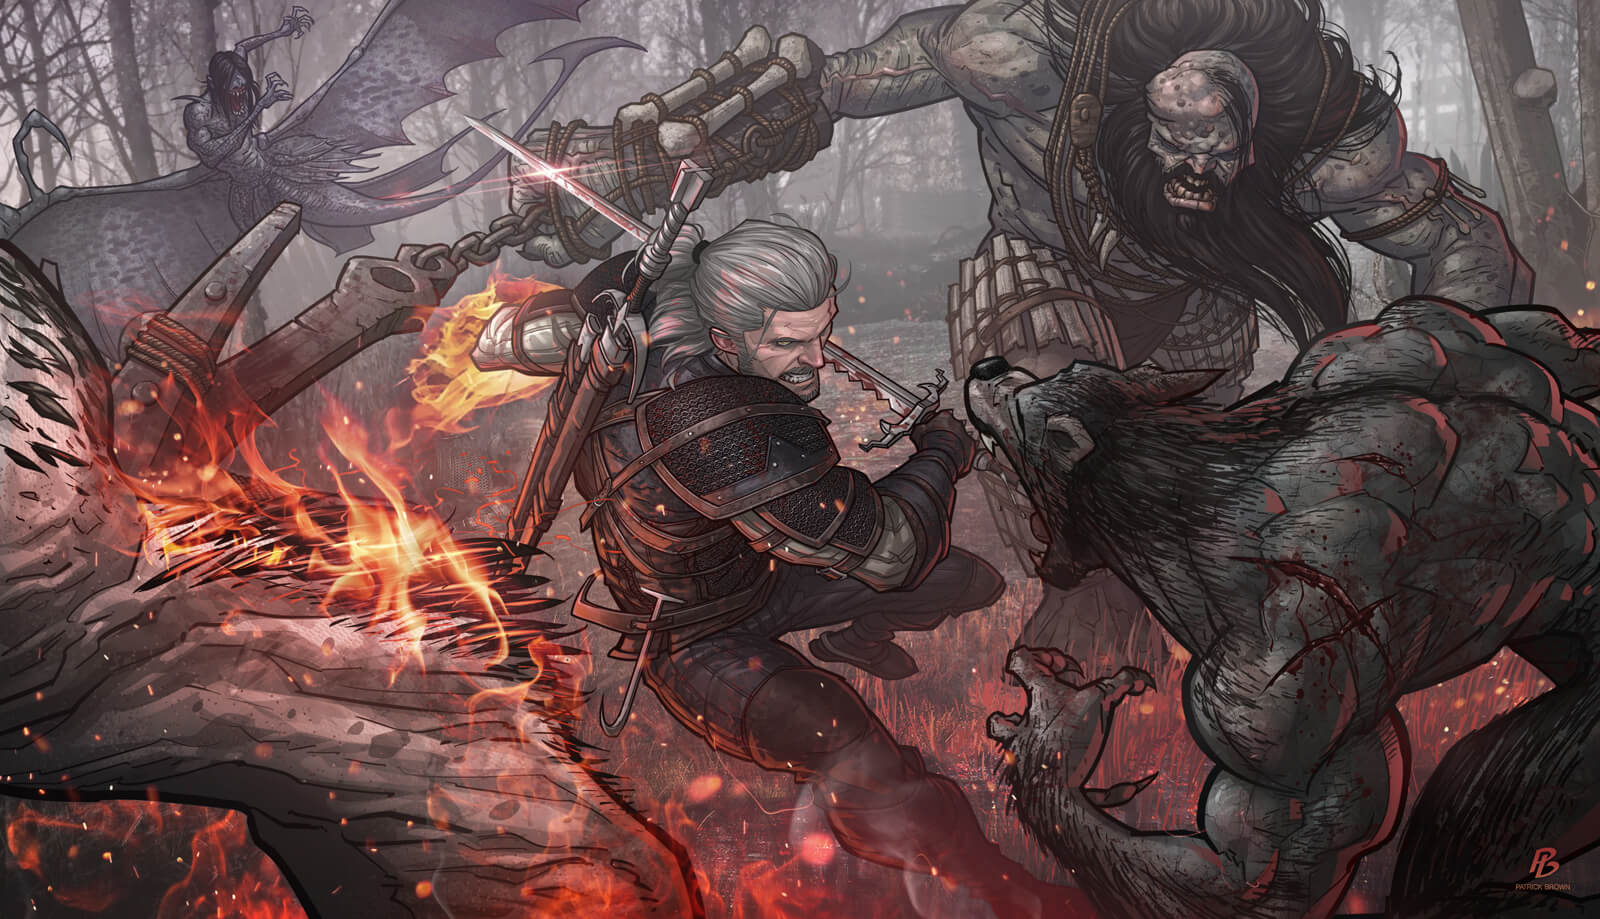 The Witcher Comics